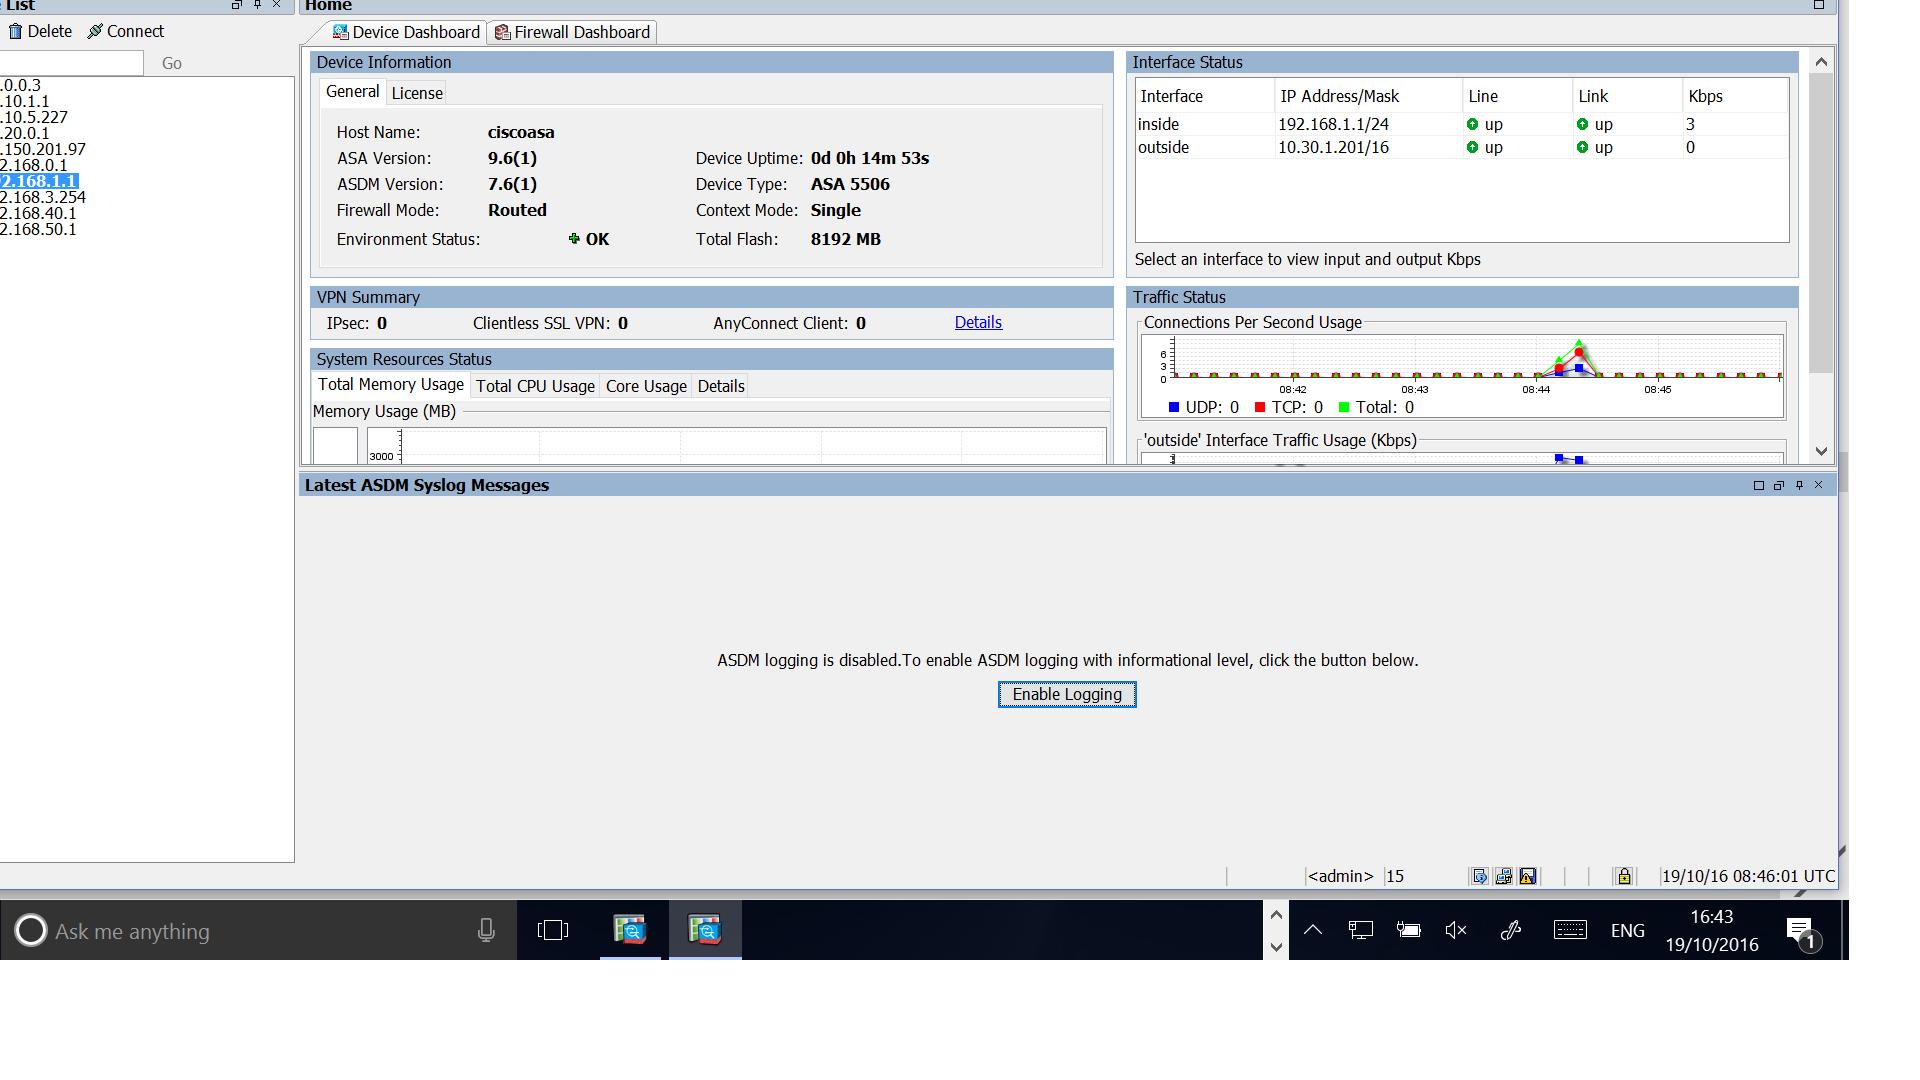 ASA5506-X Firepower services ASDM login Issue